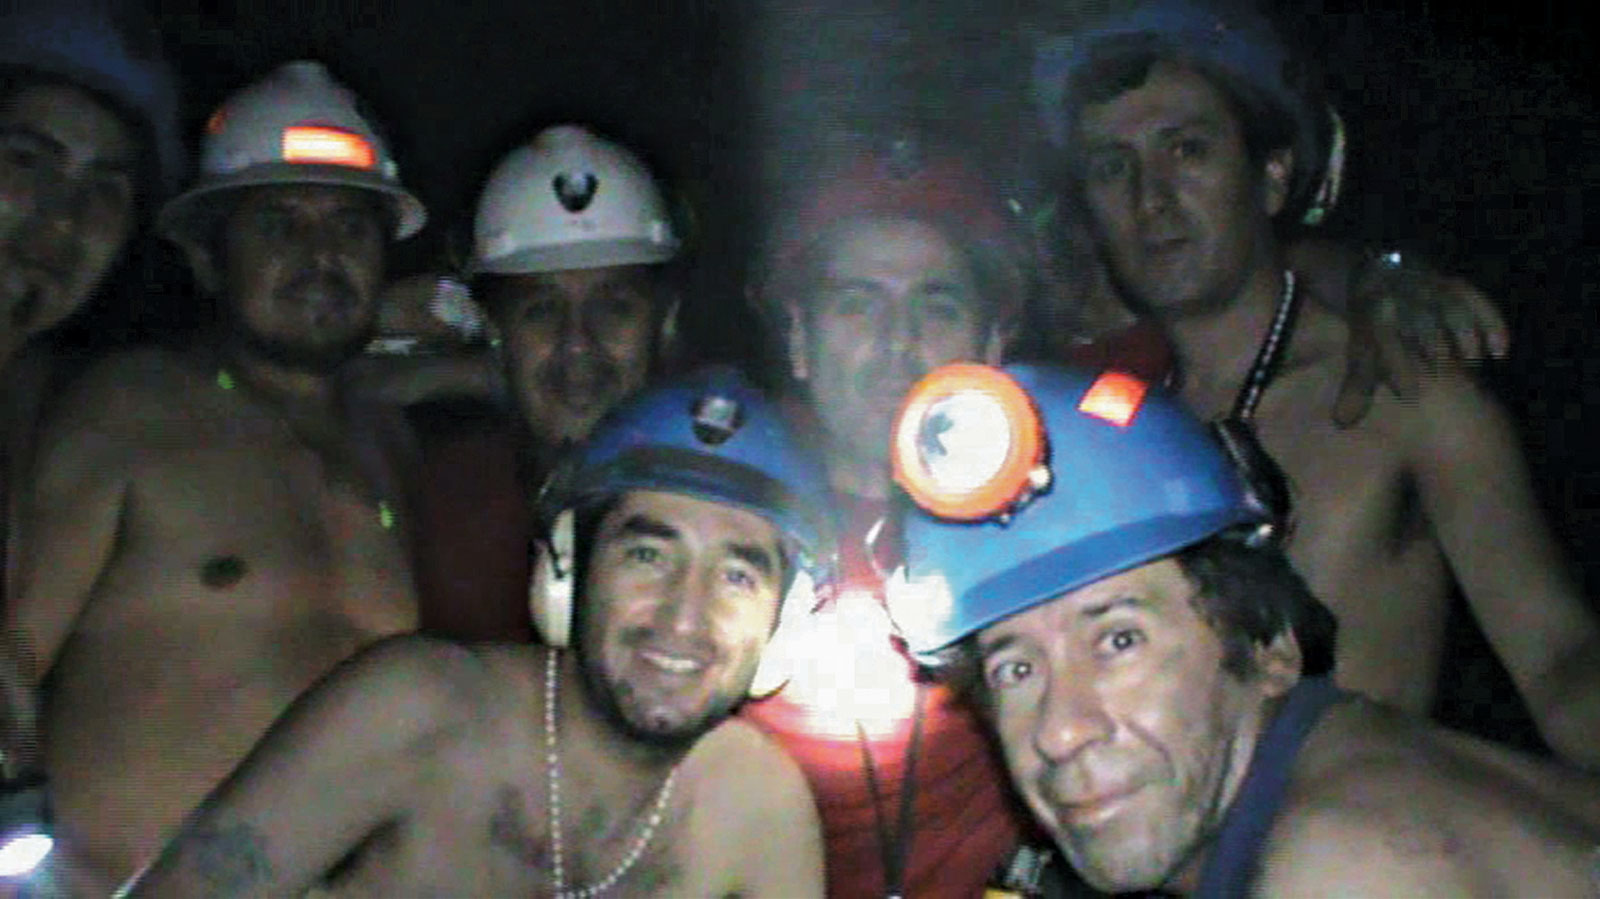 Mineiros chilenos